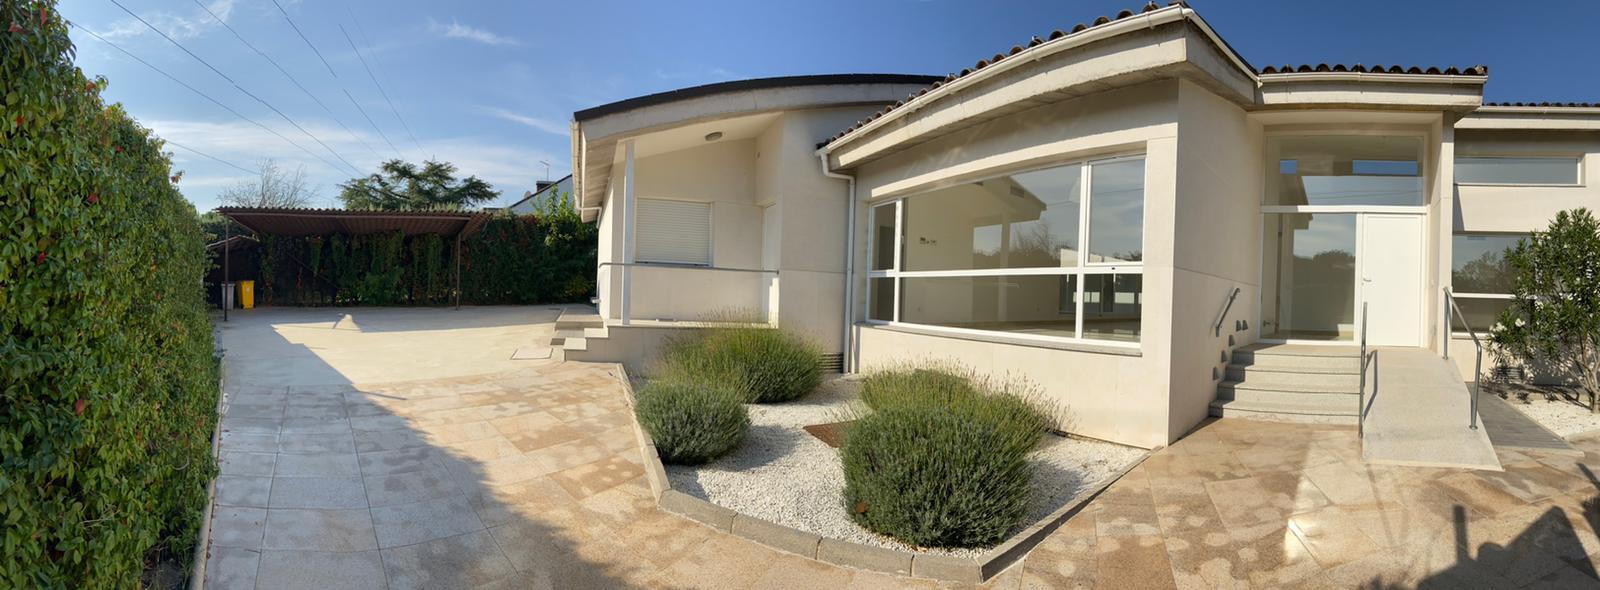 House villa 530 sq m